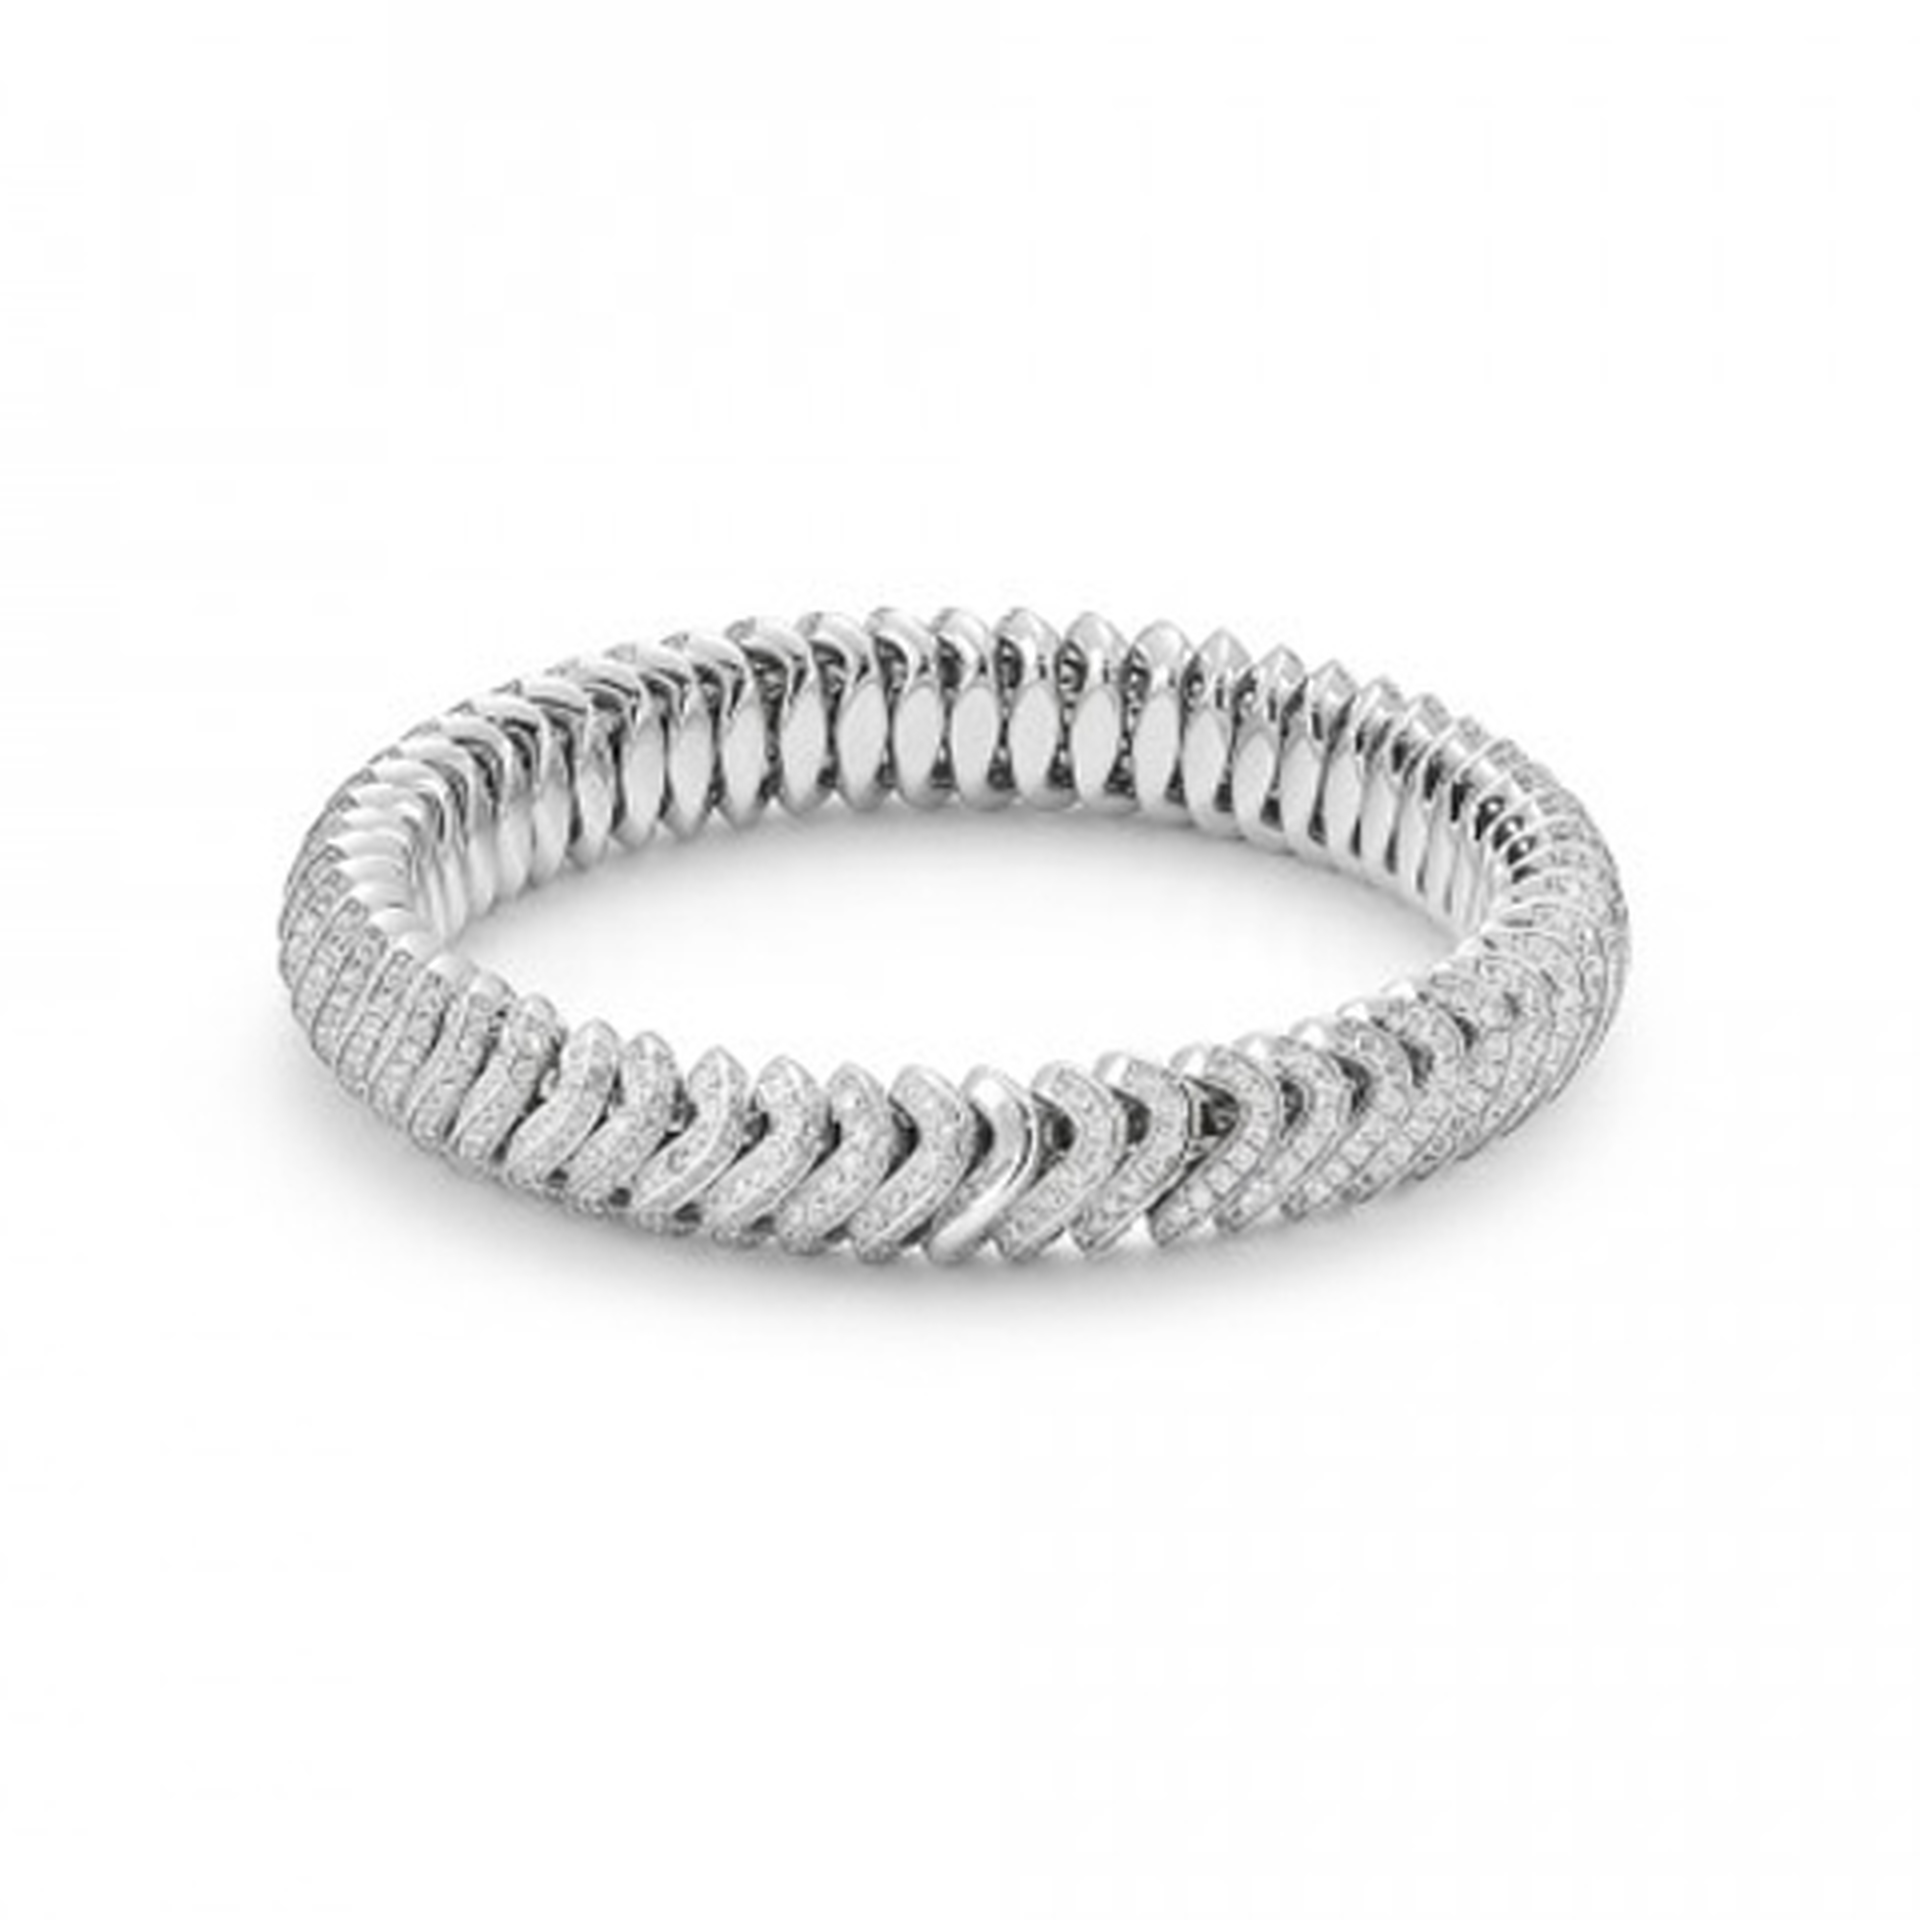 Fope 18ct White Gold Flex'It Full Vendome Diamond Bracelet